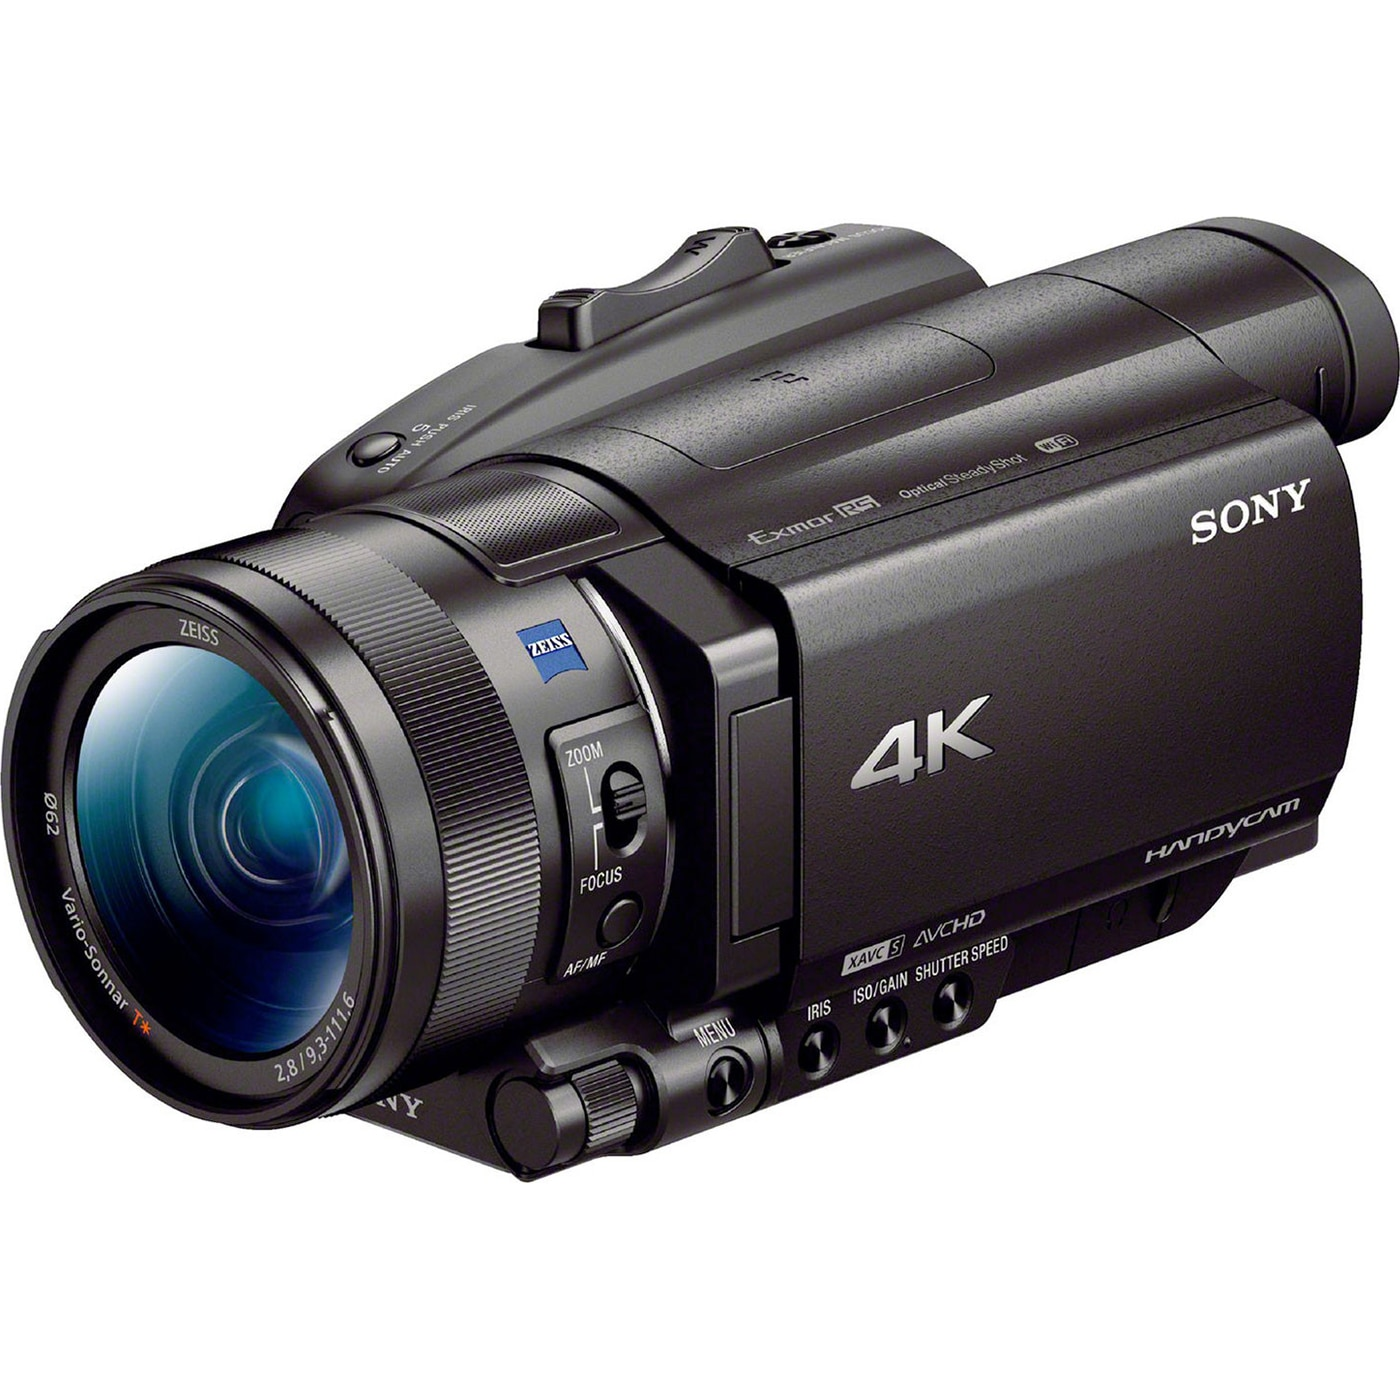 Fotografie Camera video Sony Handycam FDR-AX700, 4K HDR(HLG), Negru